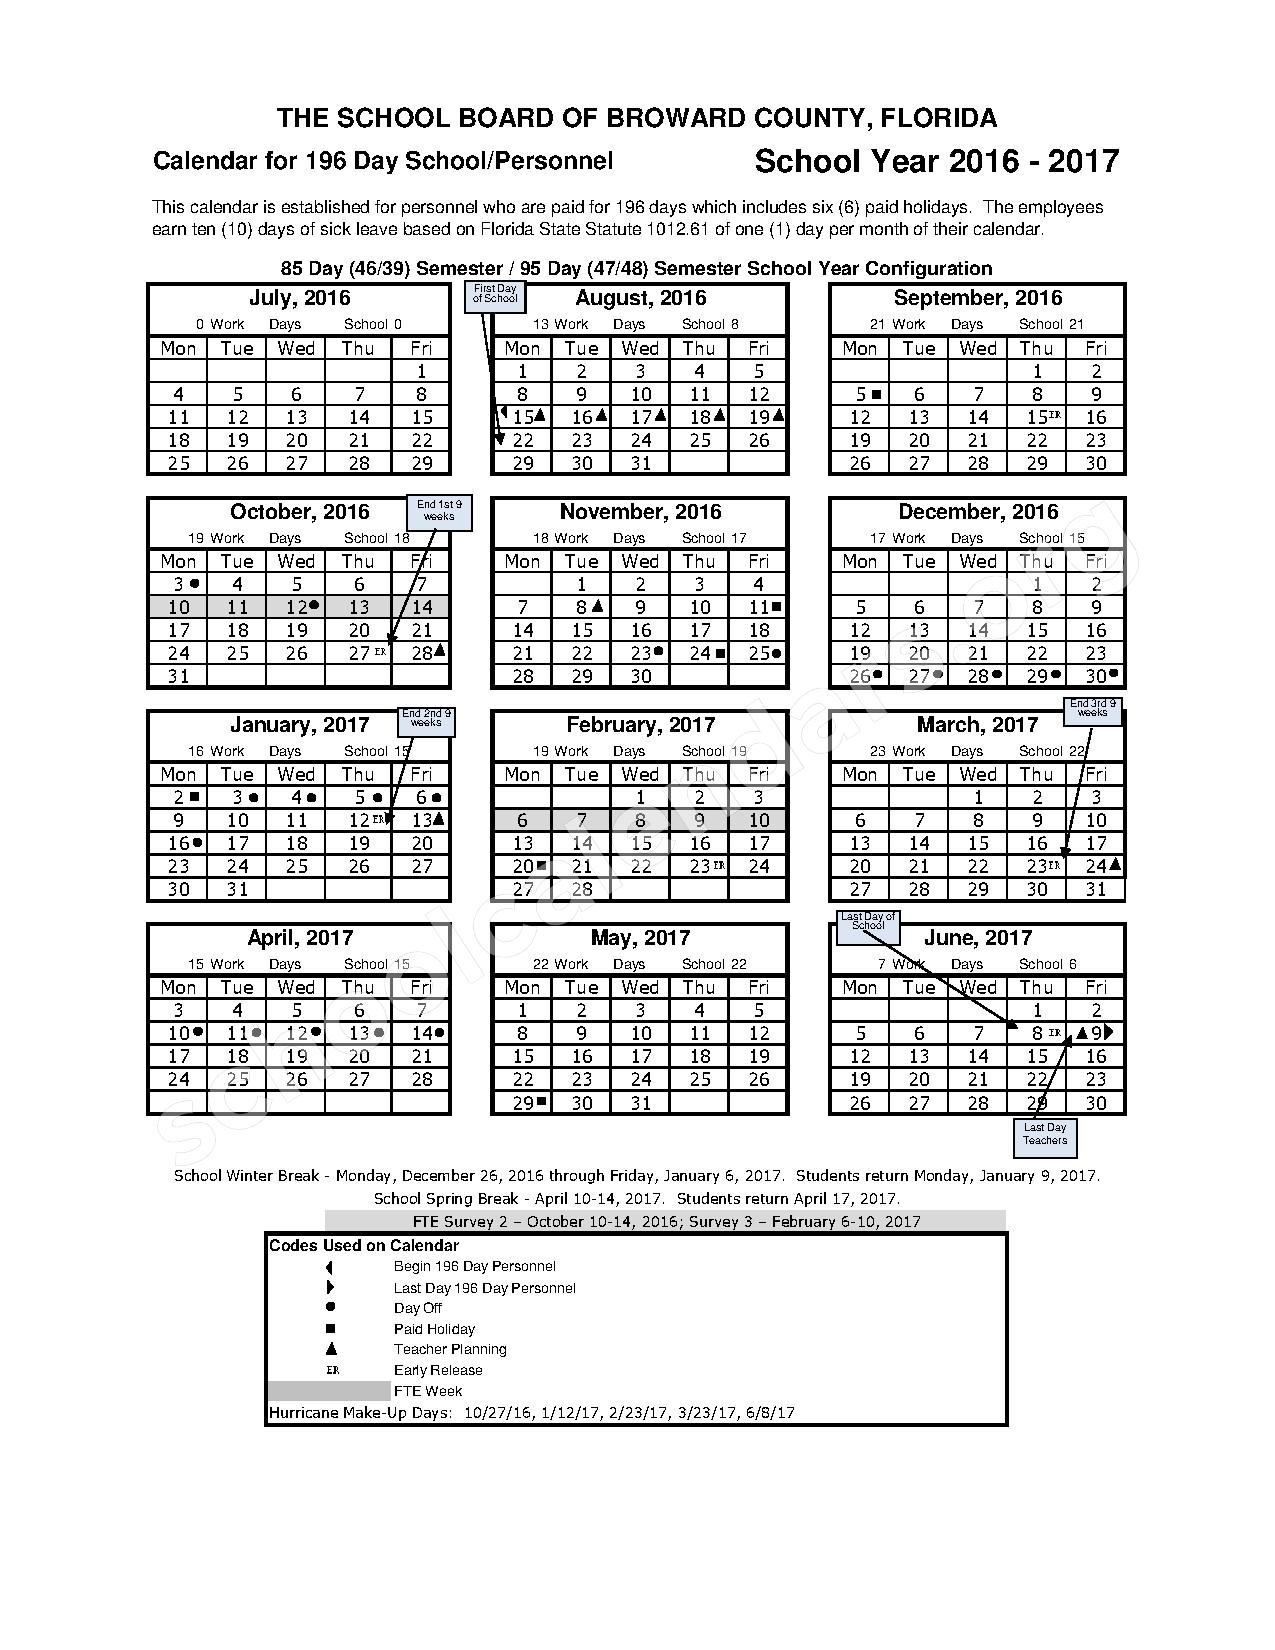 Broward County Personals Florida (FL) - Women Seeking Men